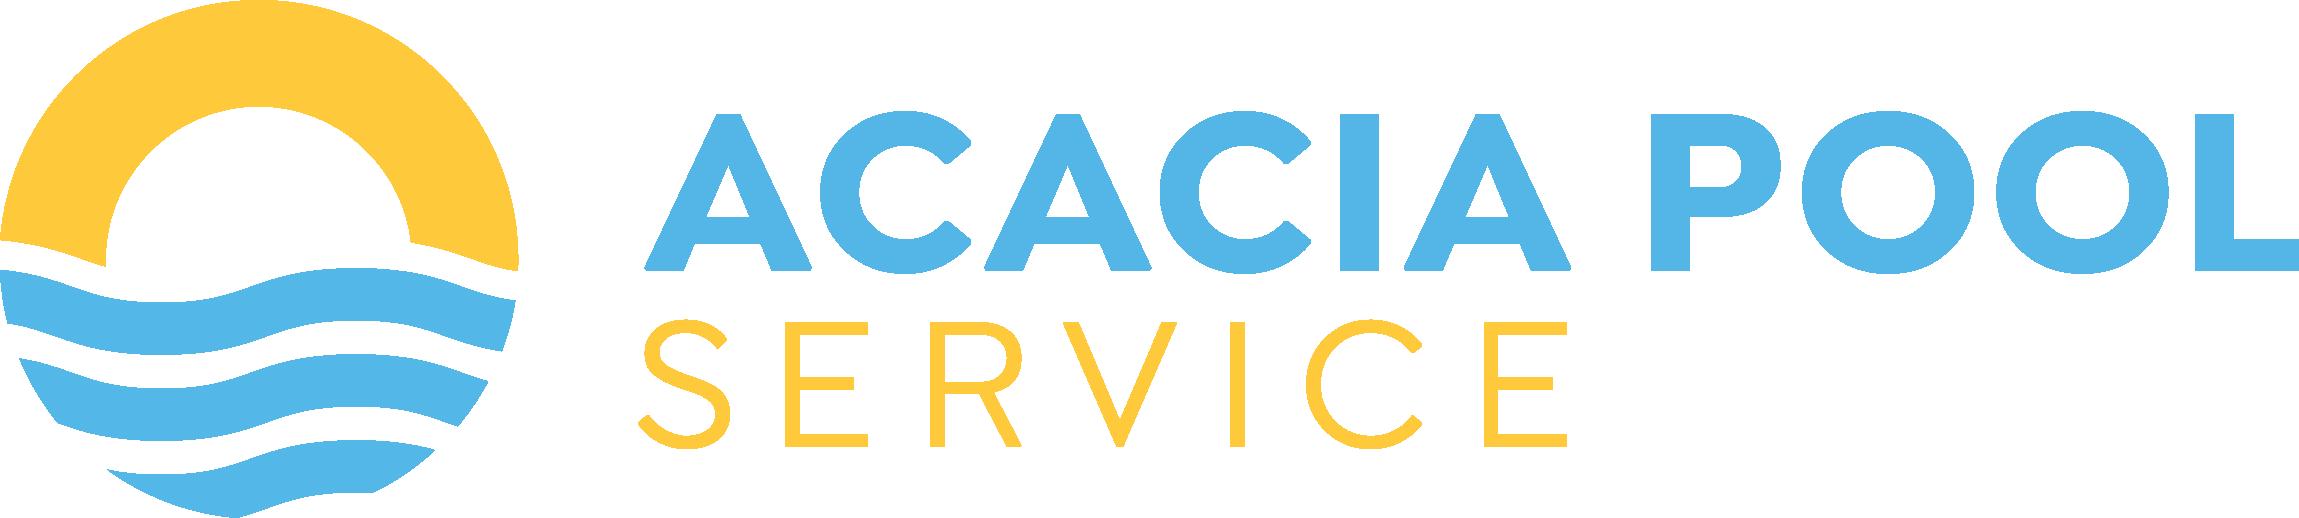 Acacia Pool Service